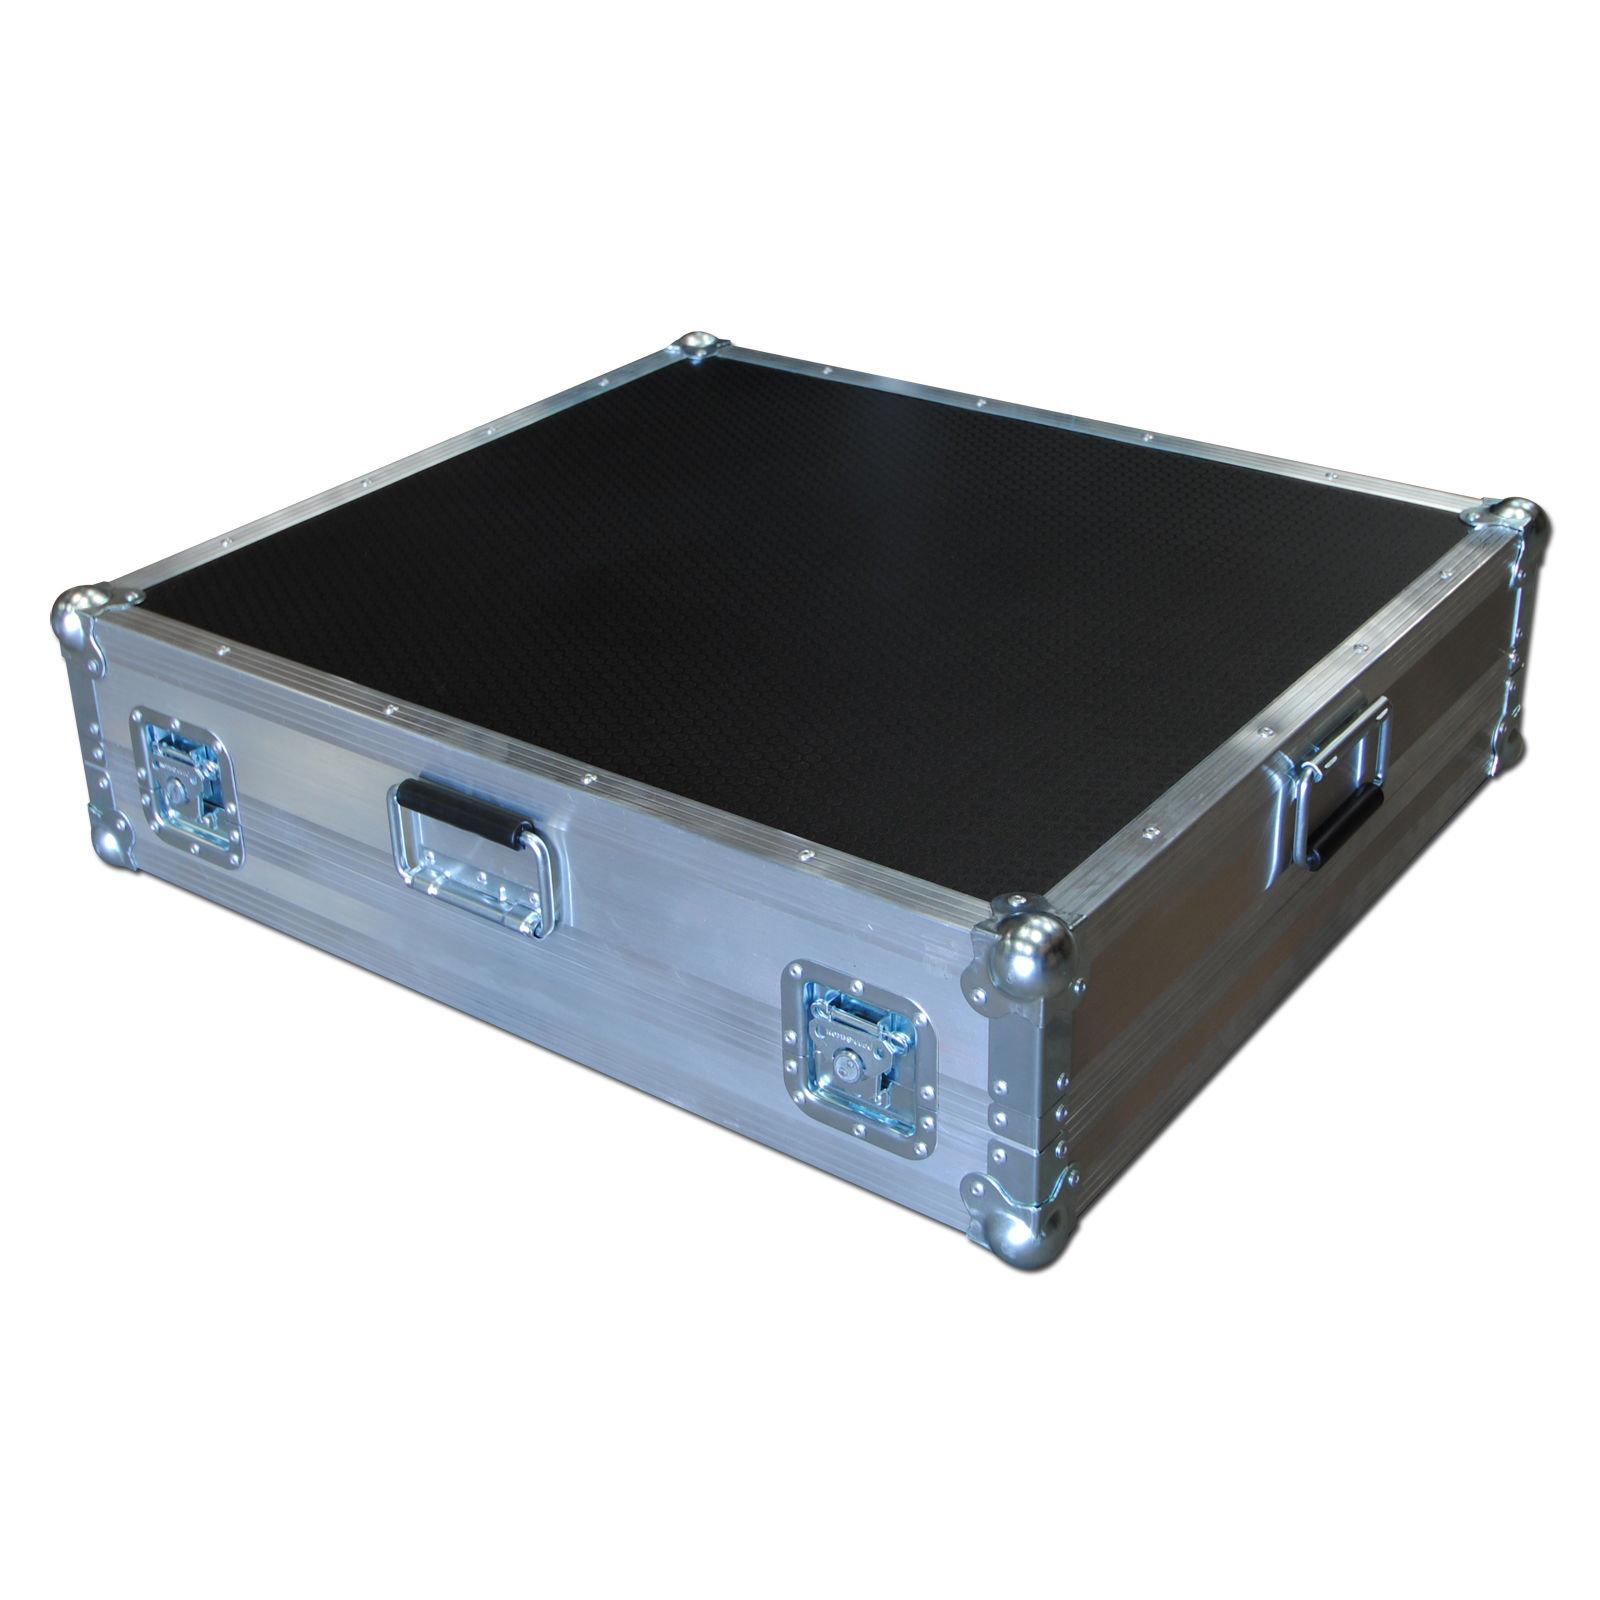 mixer briefcase flight case for alesis studio 32. Black Bedroom Furniture Sets. Home Design Ideas